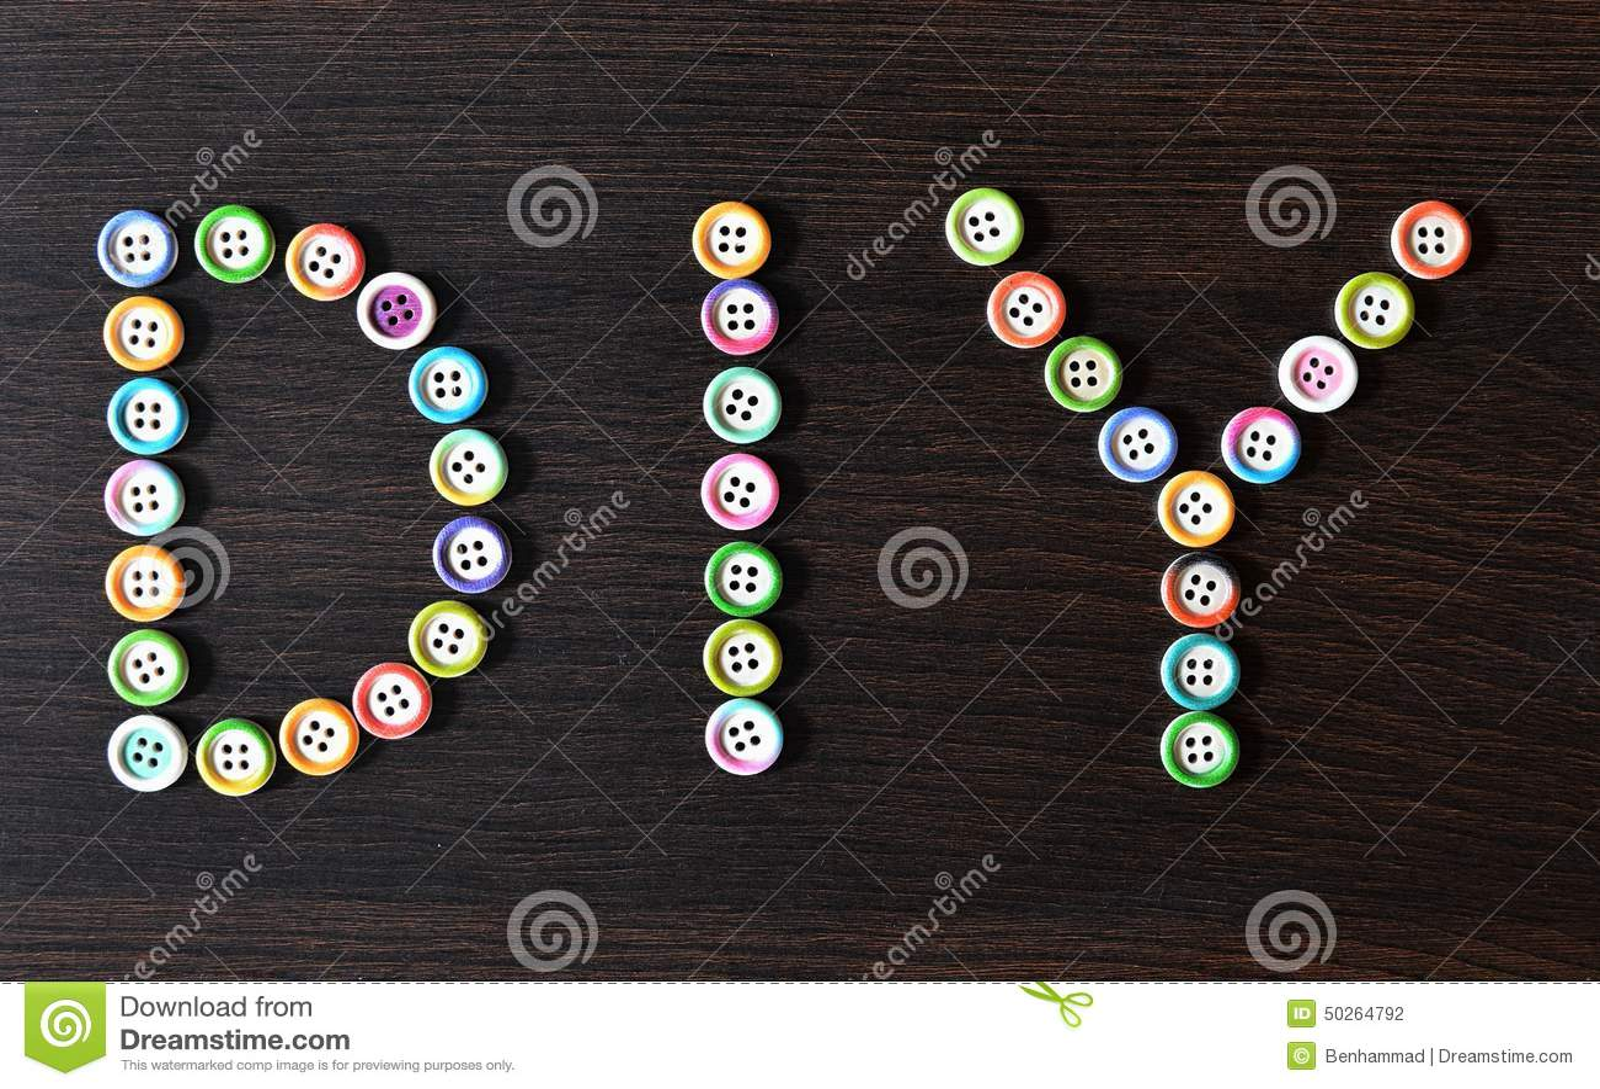 Diy lettering stock illustration illustration of letters 50264792 diy lettering solutioingenieria Choice Image